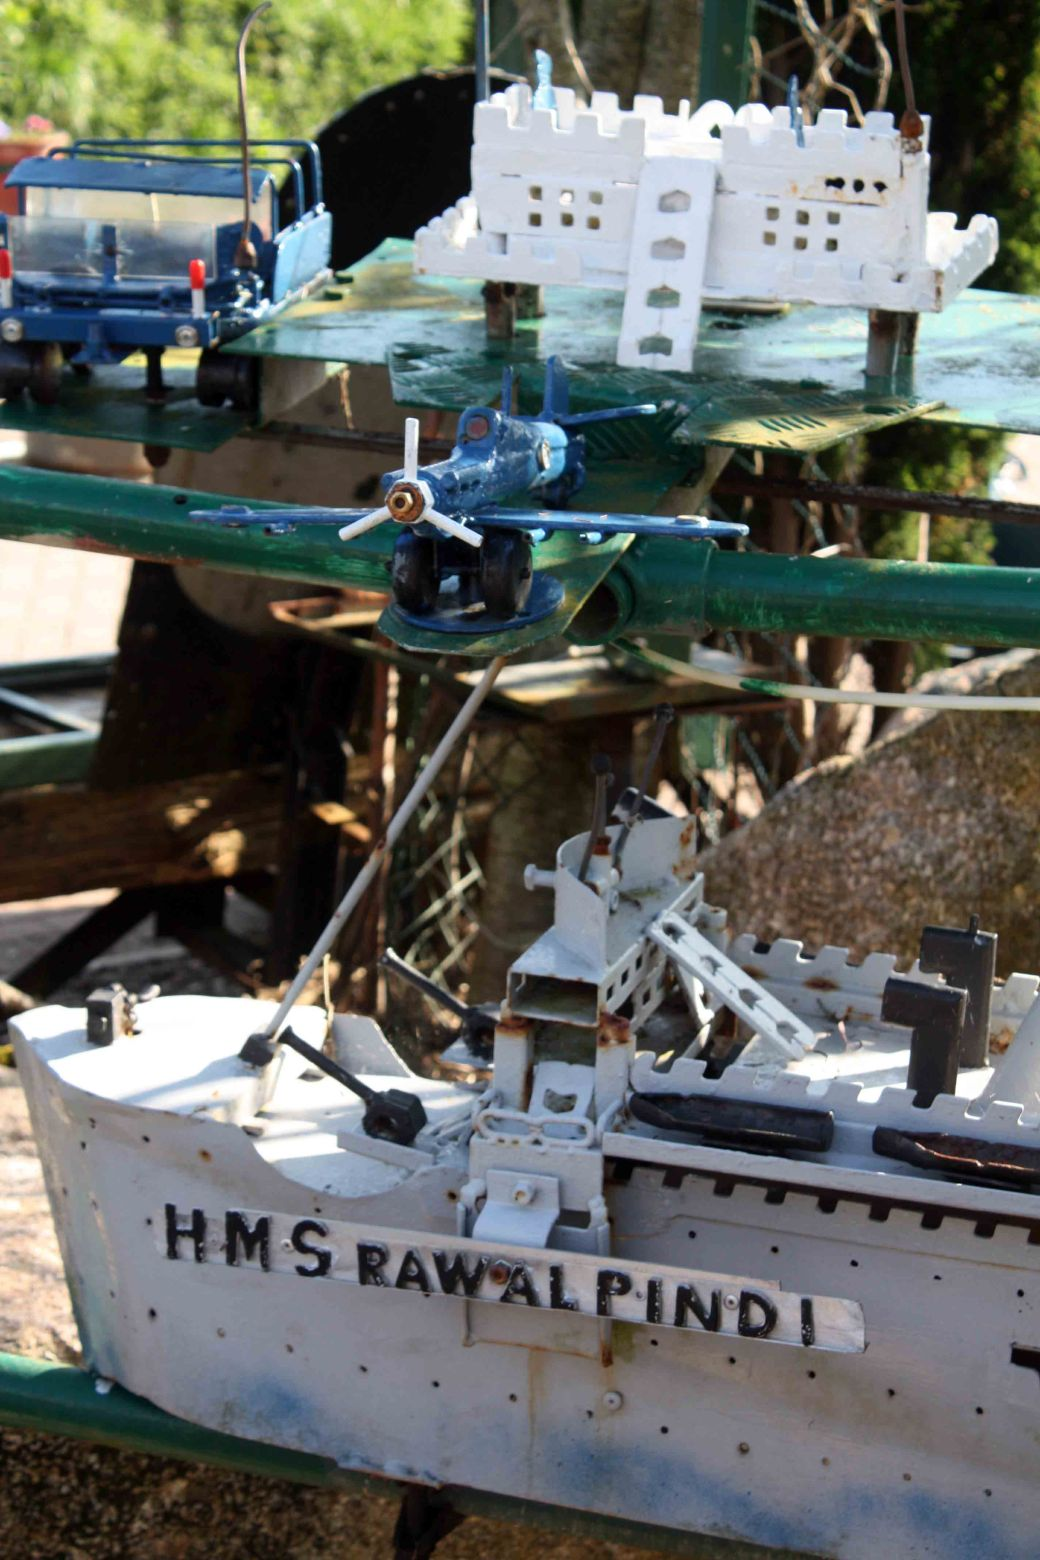 HMS Rawalpindi